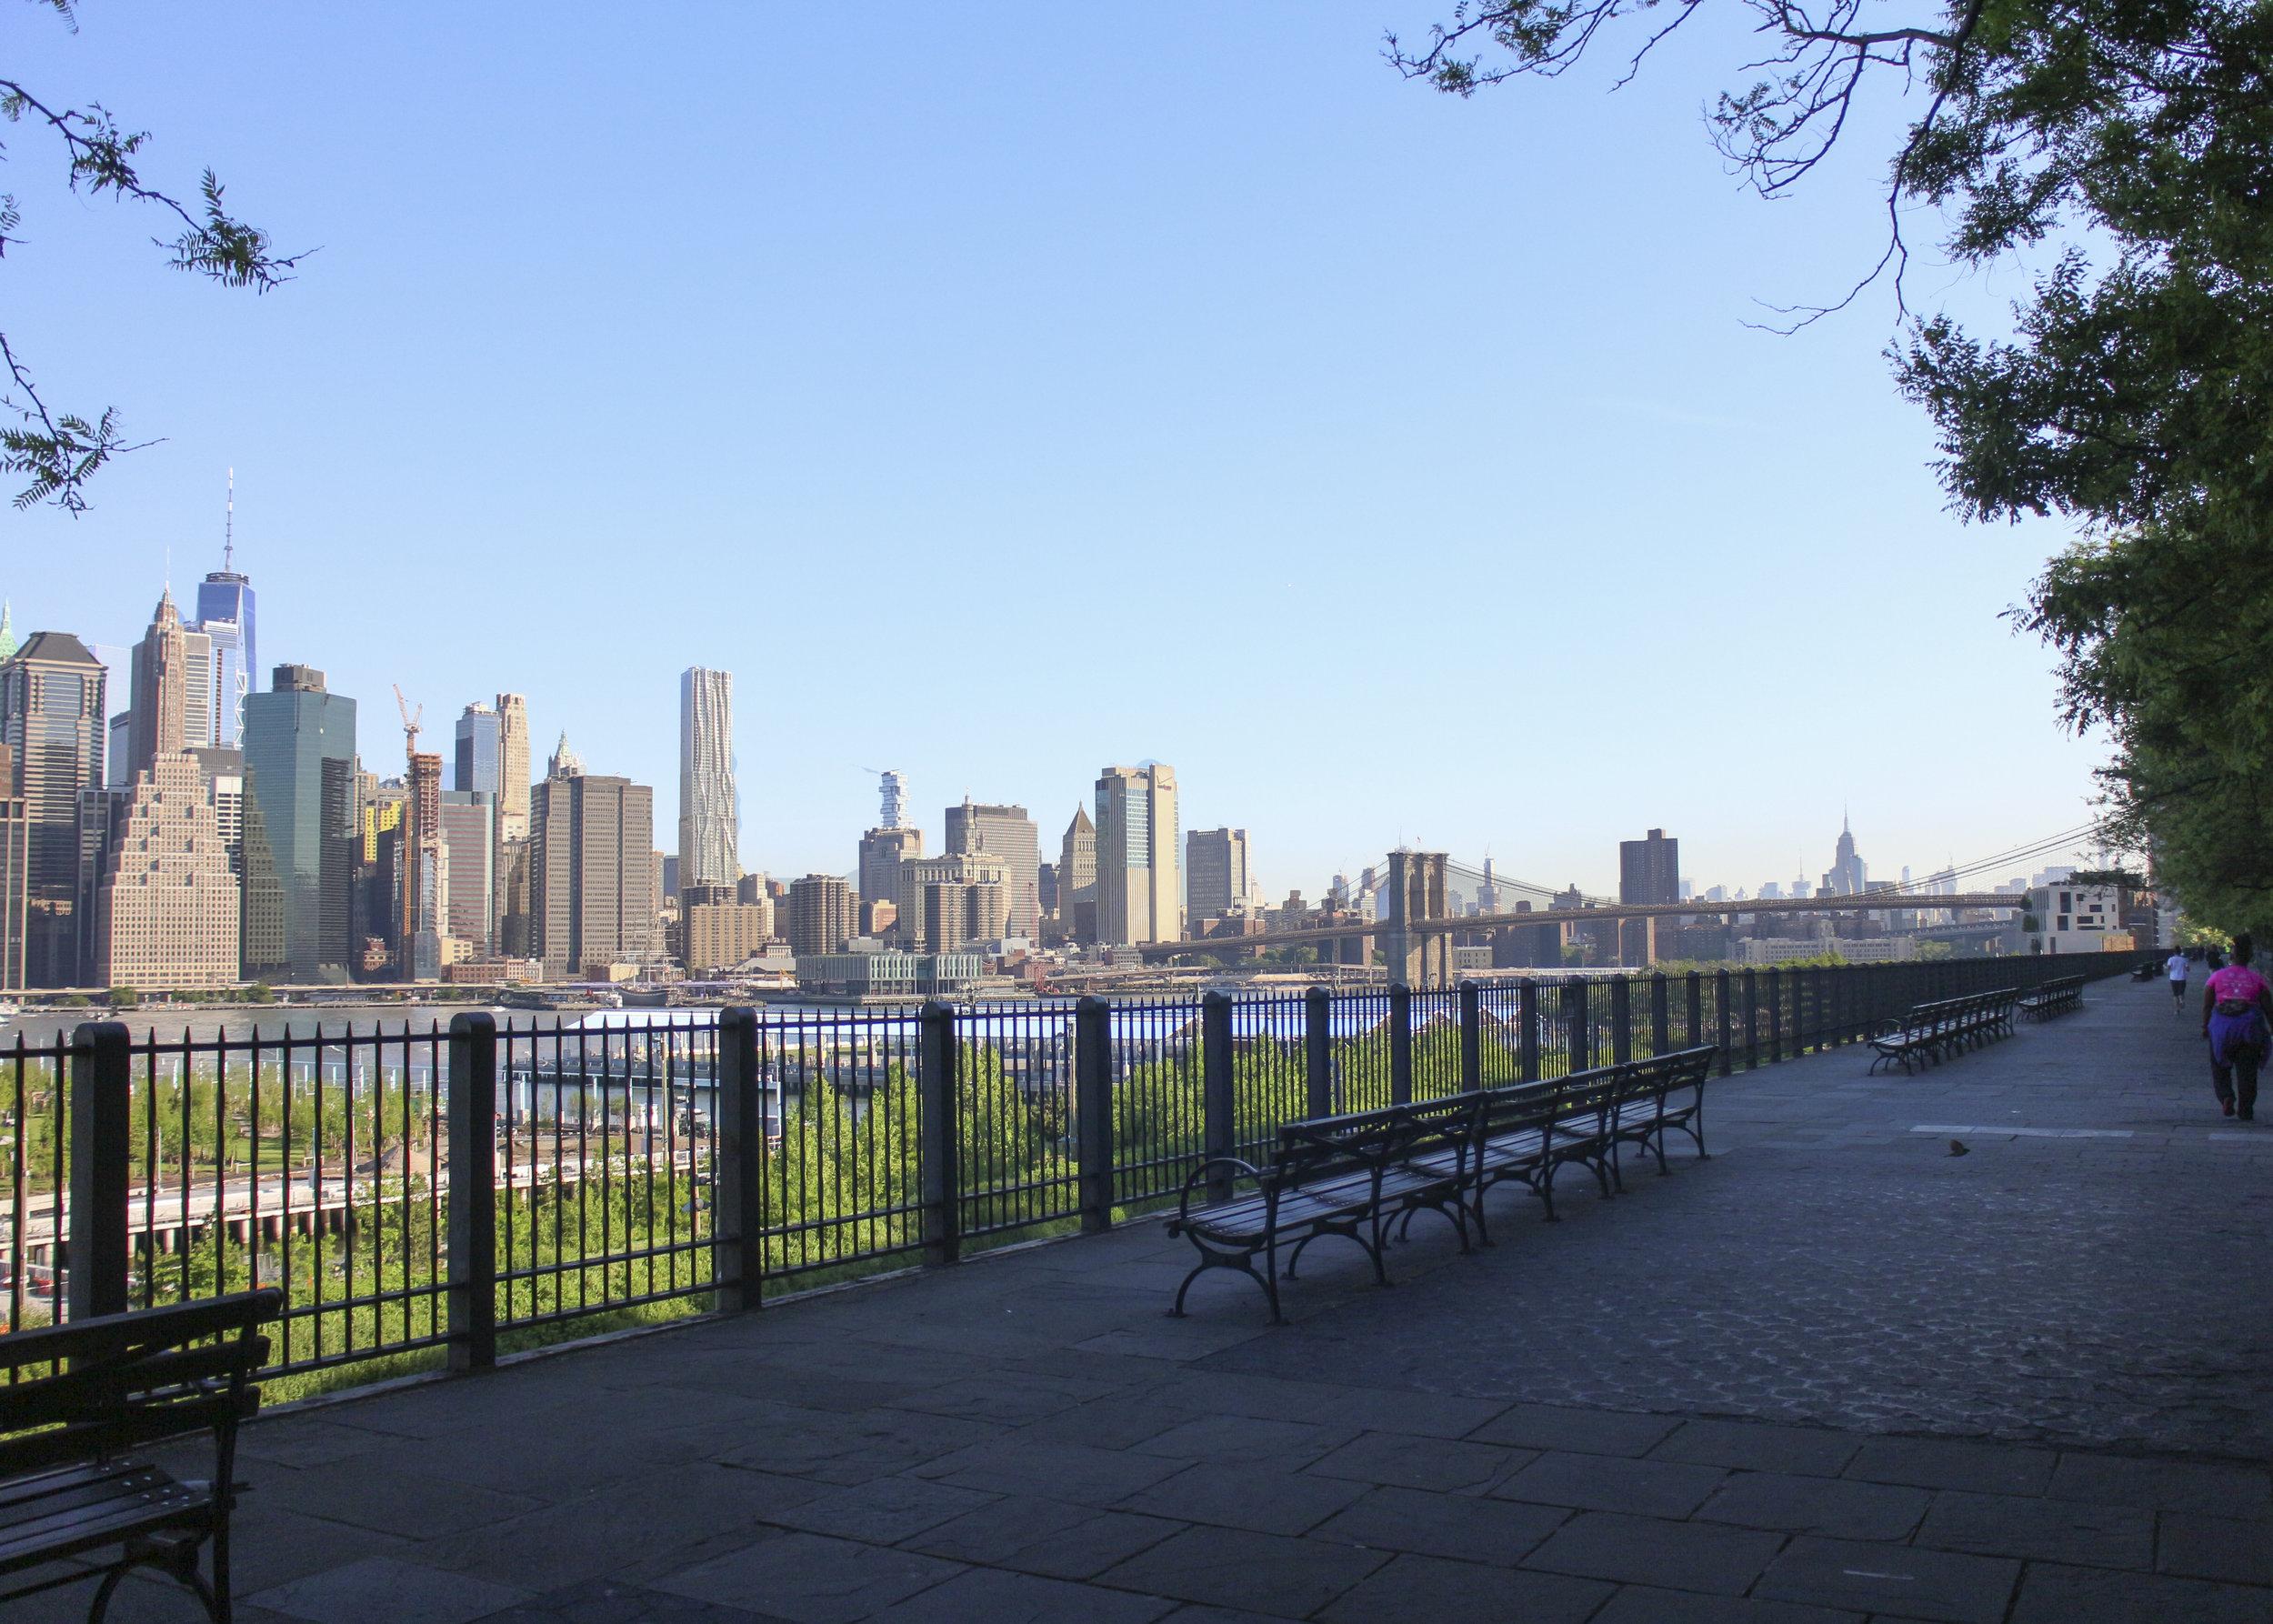 Бруклин хайтс променад.jpg